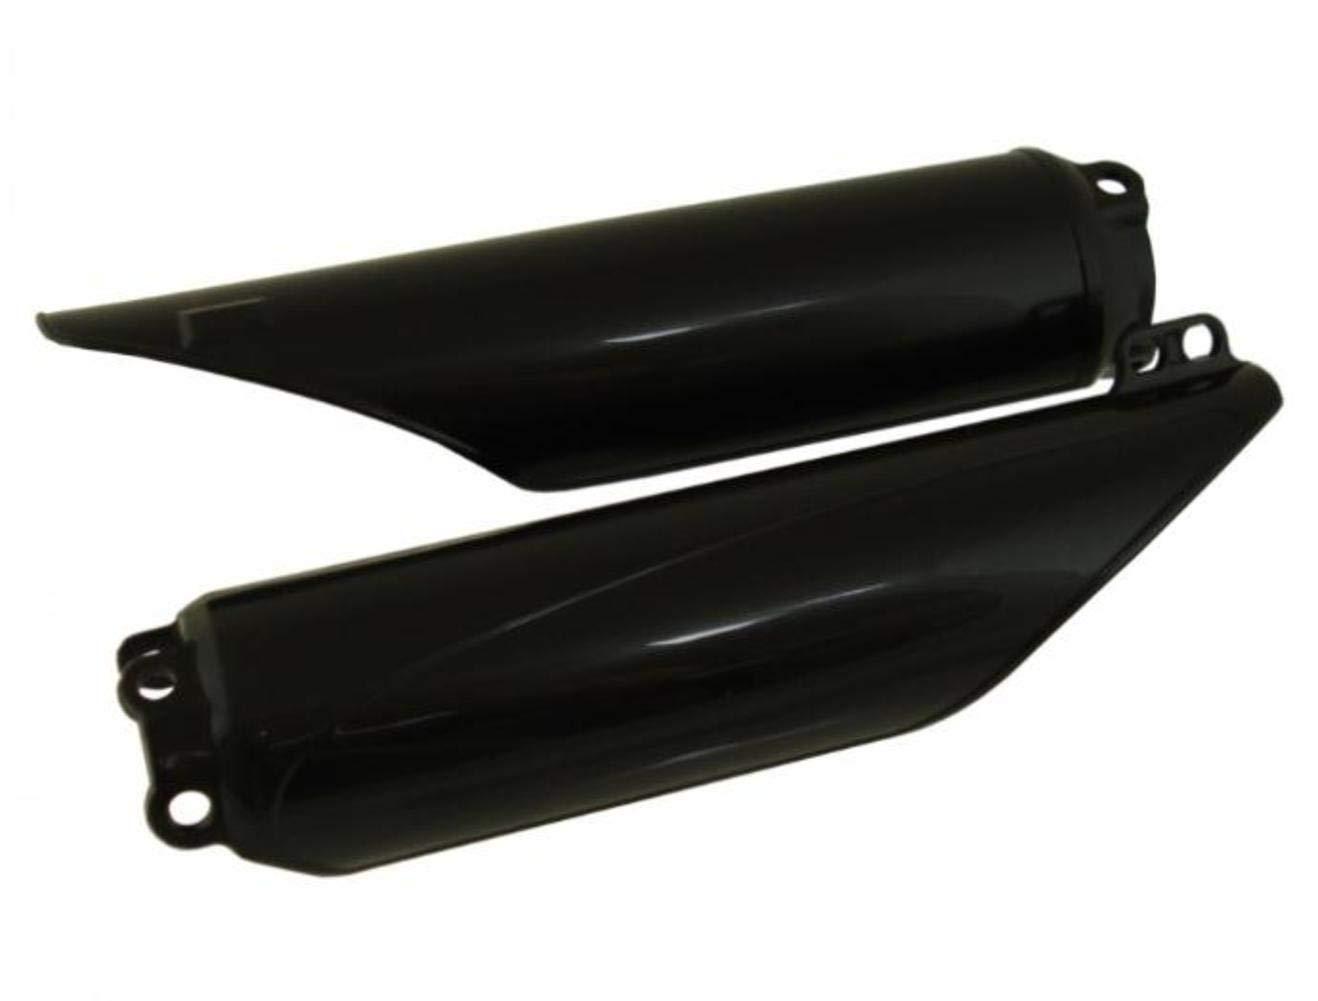 06-08 KAWASAKI KX250F Polisport Fork Cover Set BLACK